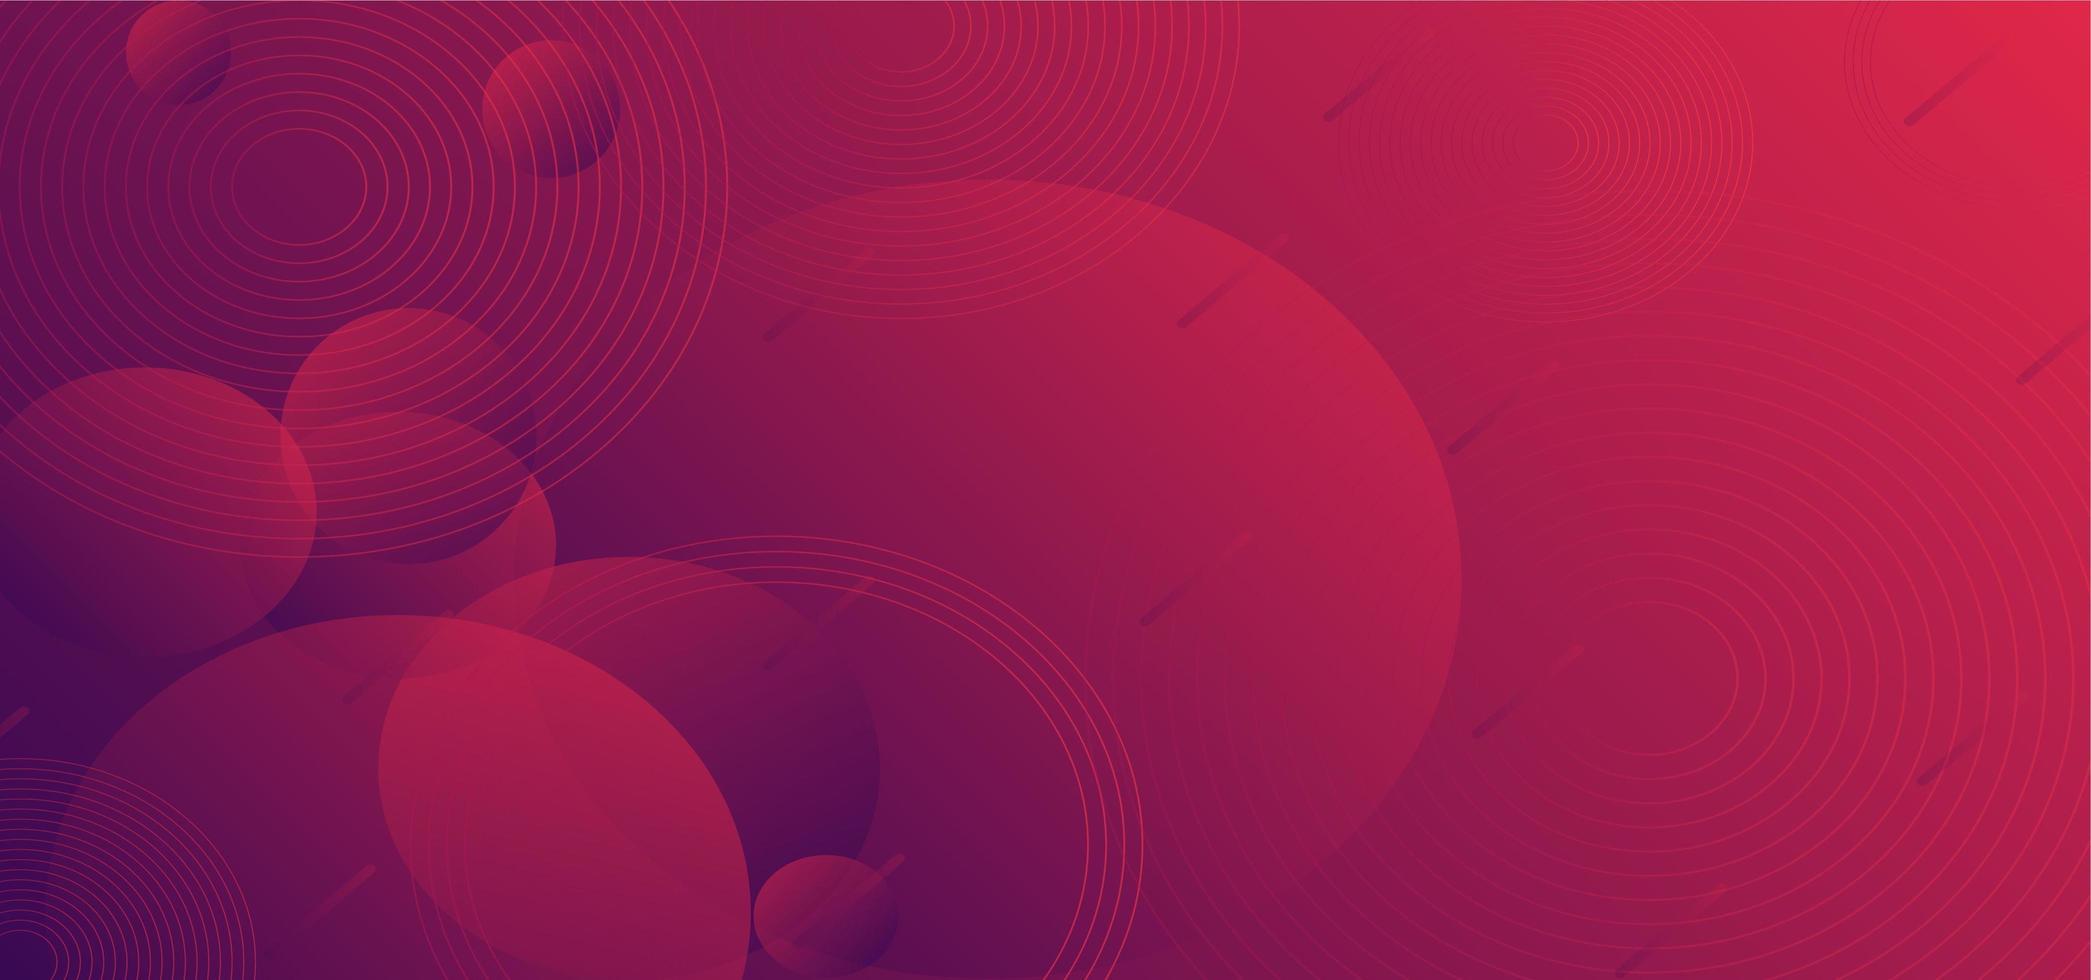 Liquify Fluid Color Banner Background vector